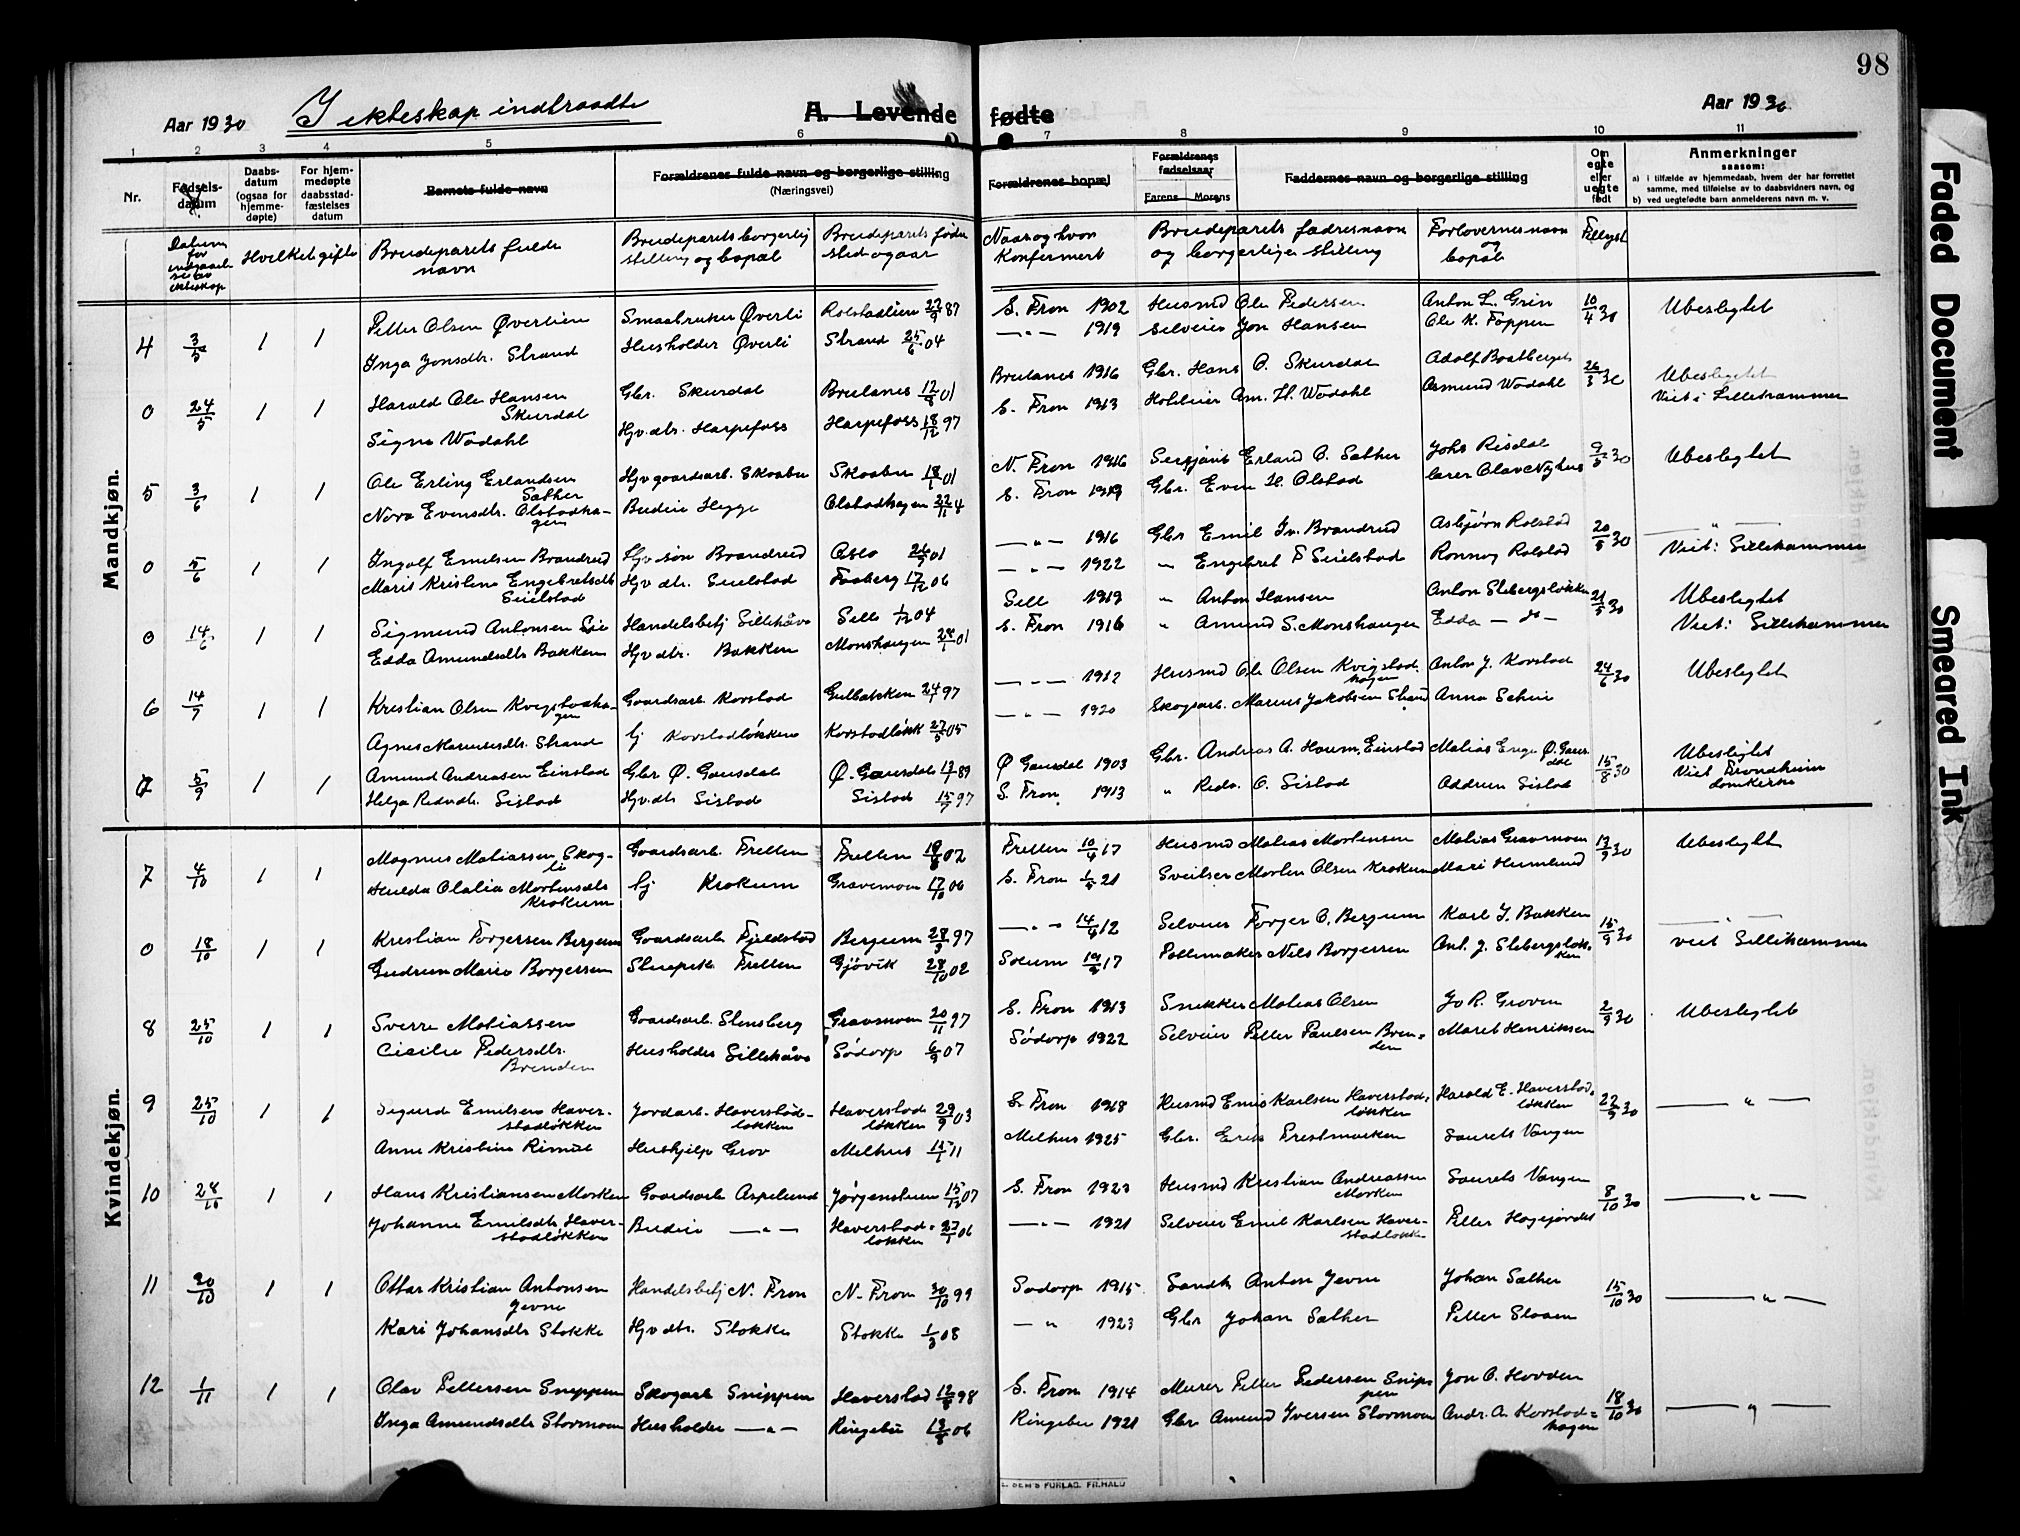 SAH, Sør-Fron prestekontor, H/Ha/Hab/L0005: Klokkerbok nr. 5, 1912-1930, s. 98